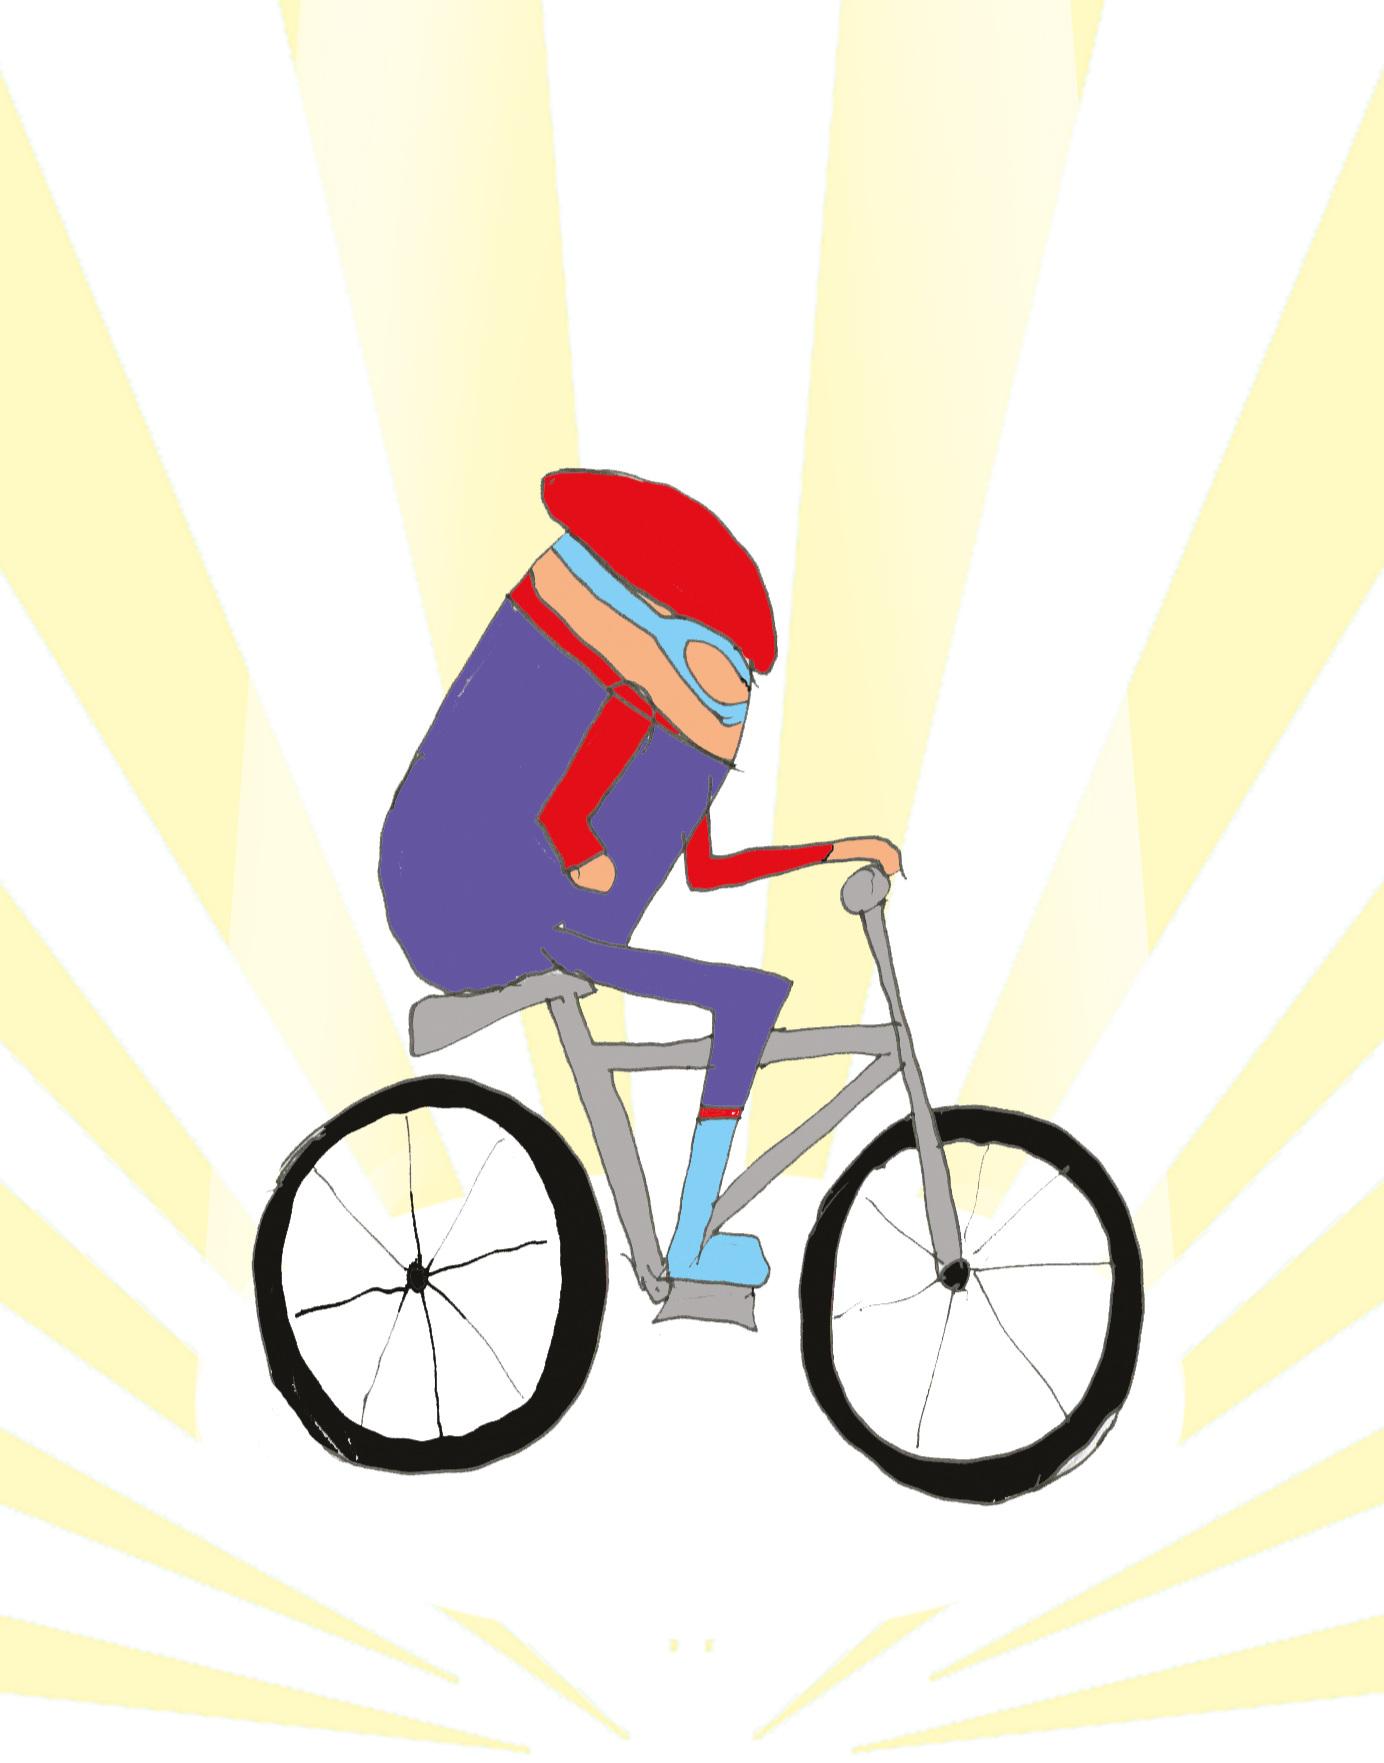 Cyclist+no+arm.jpg